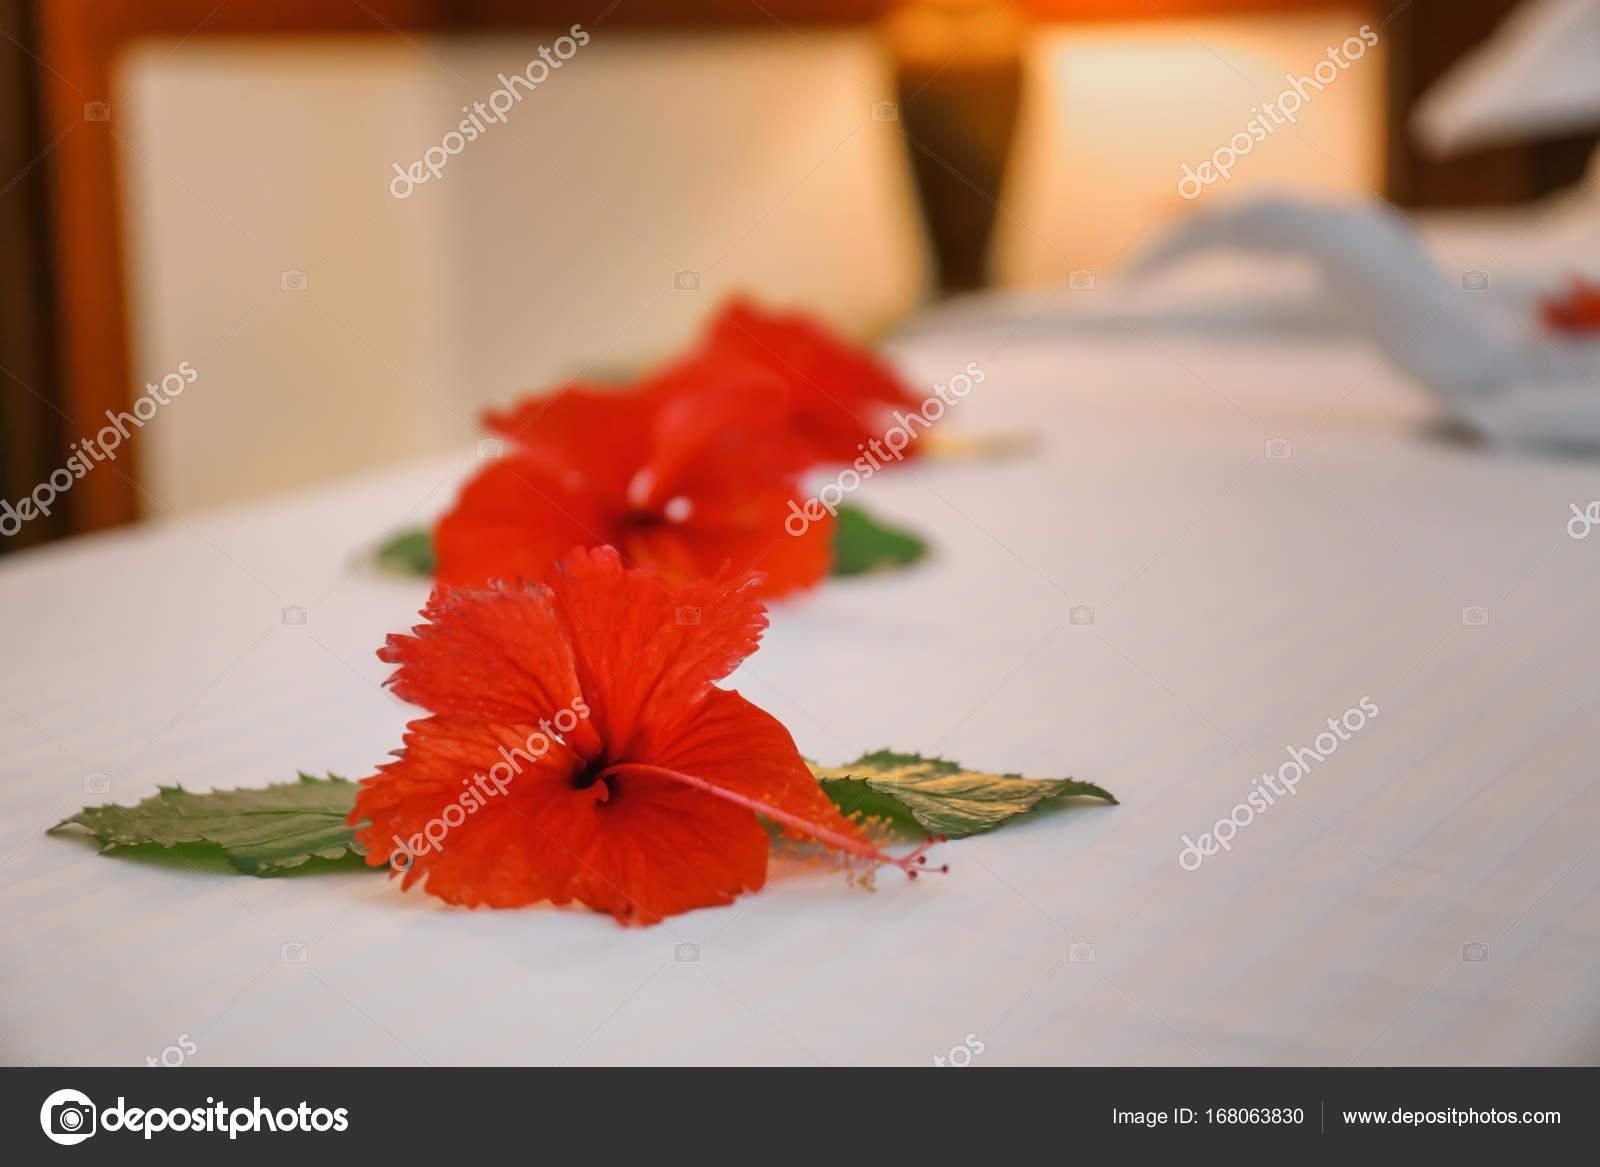 Beautiful flowers on bed in hotel room stock photo belchonock beautiful flowers on bed in hotel room photo by belchonock izmirmasajfo